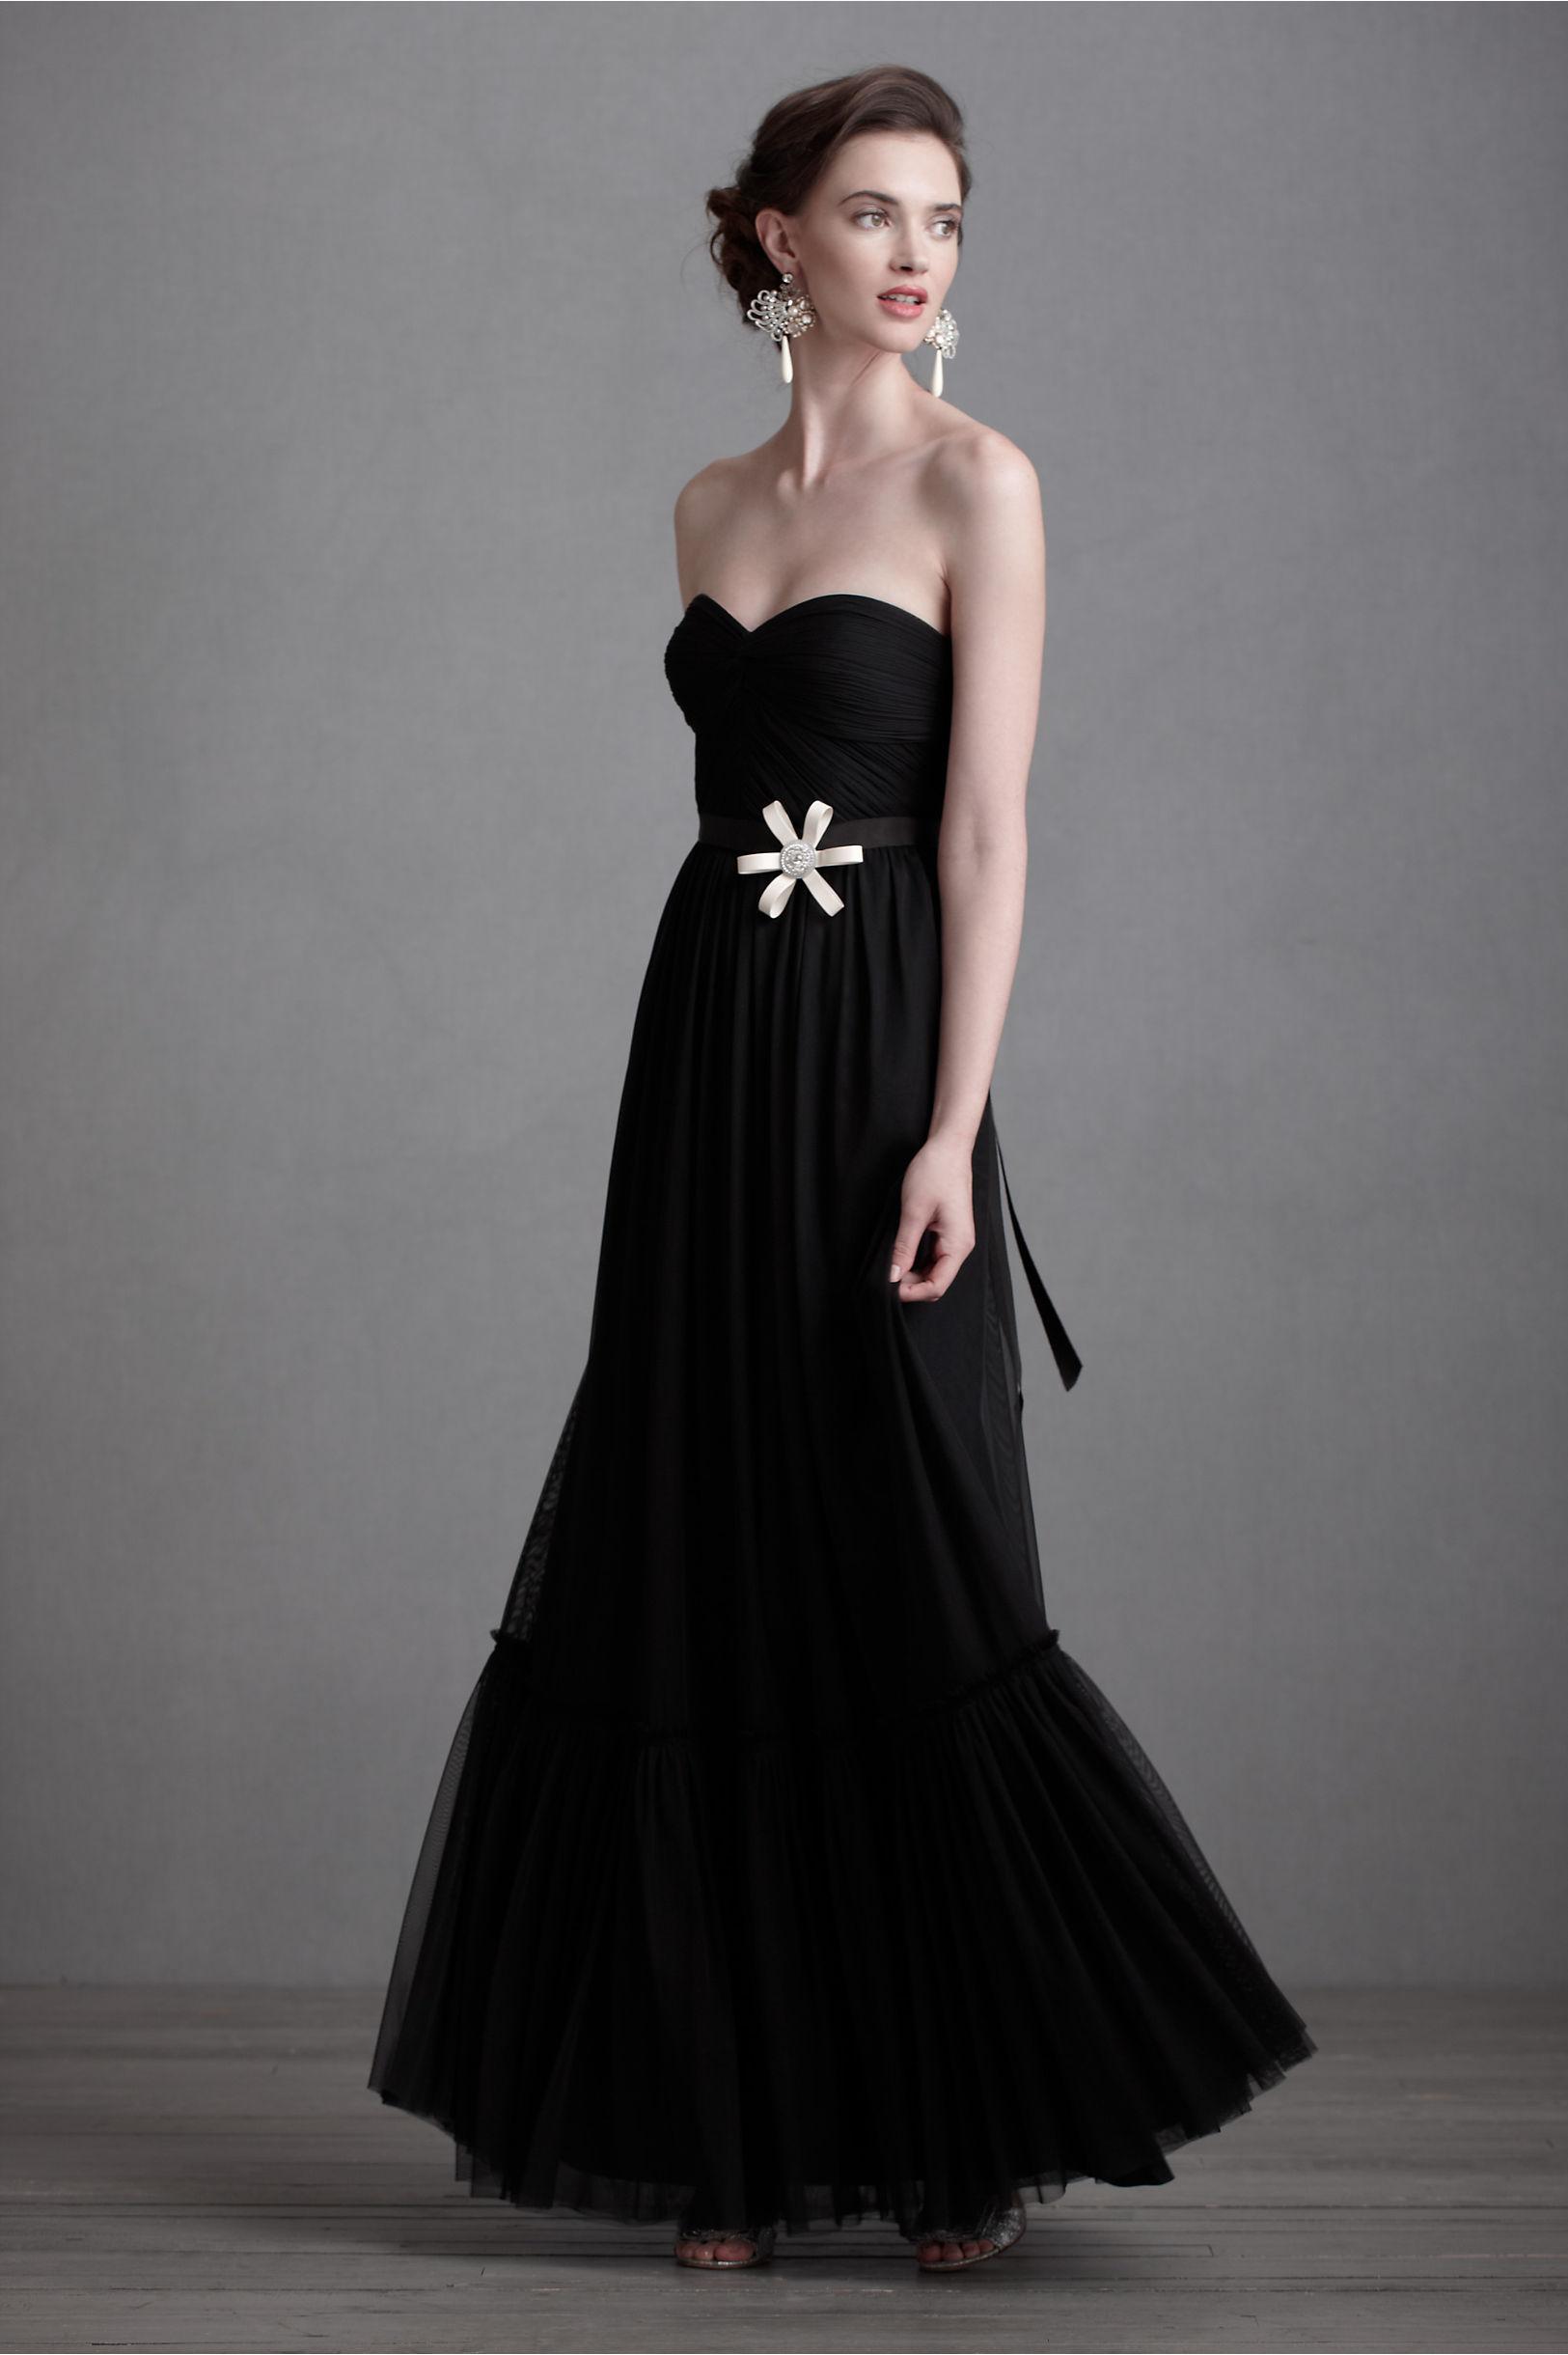 weddings with black bridesmaid dresses short black wedding dresses Weddings With Black Bridesmaid Dresses 23